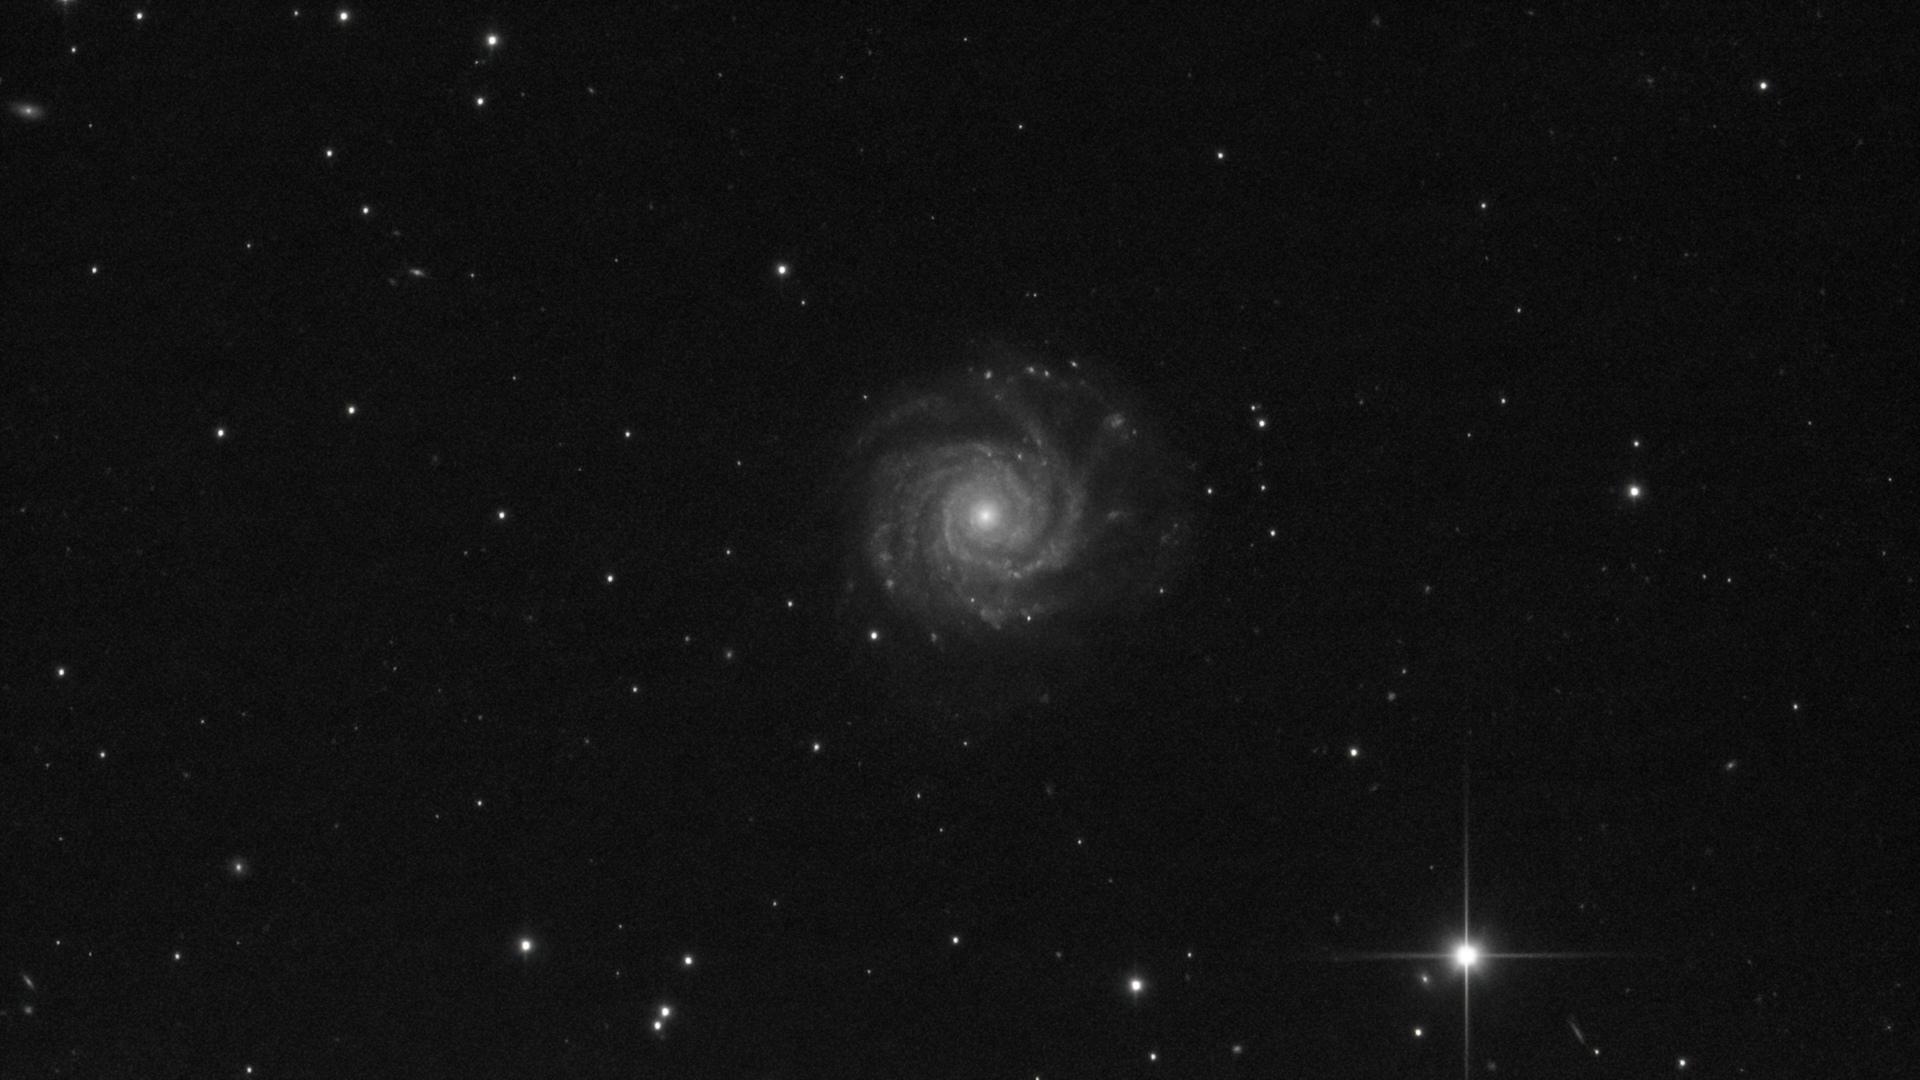 602f8759270a5_r_pp_NGC3938_stacked(1).jpg.be175a792d7db7e4709ef54245795ab8.jpg